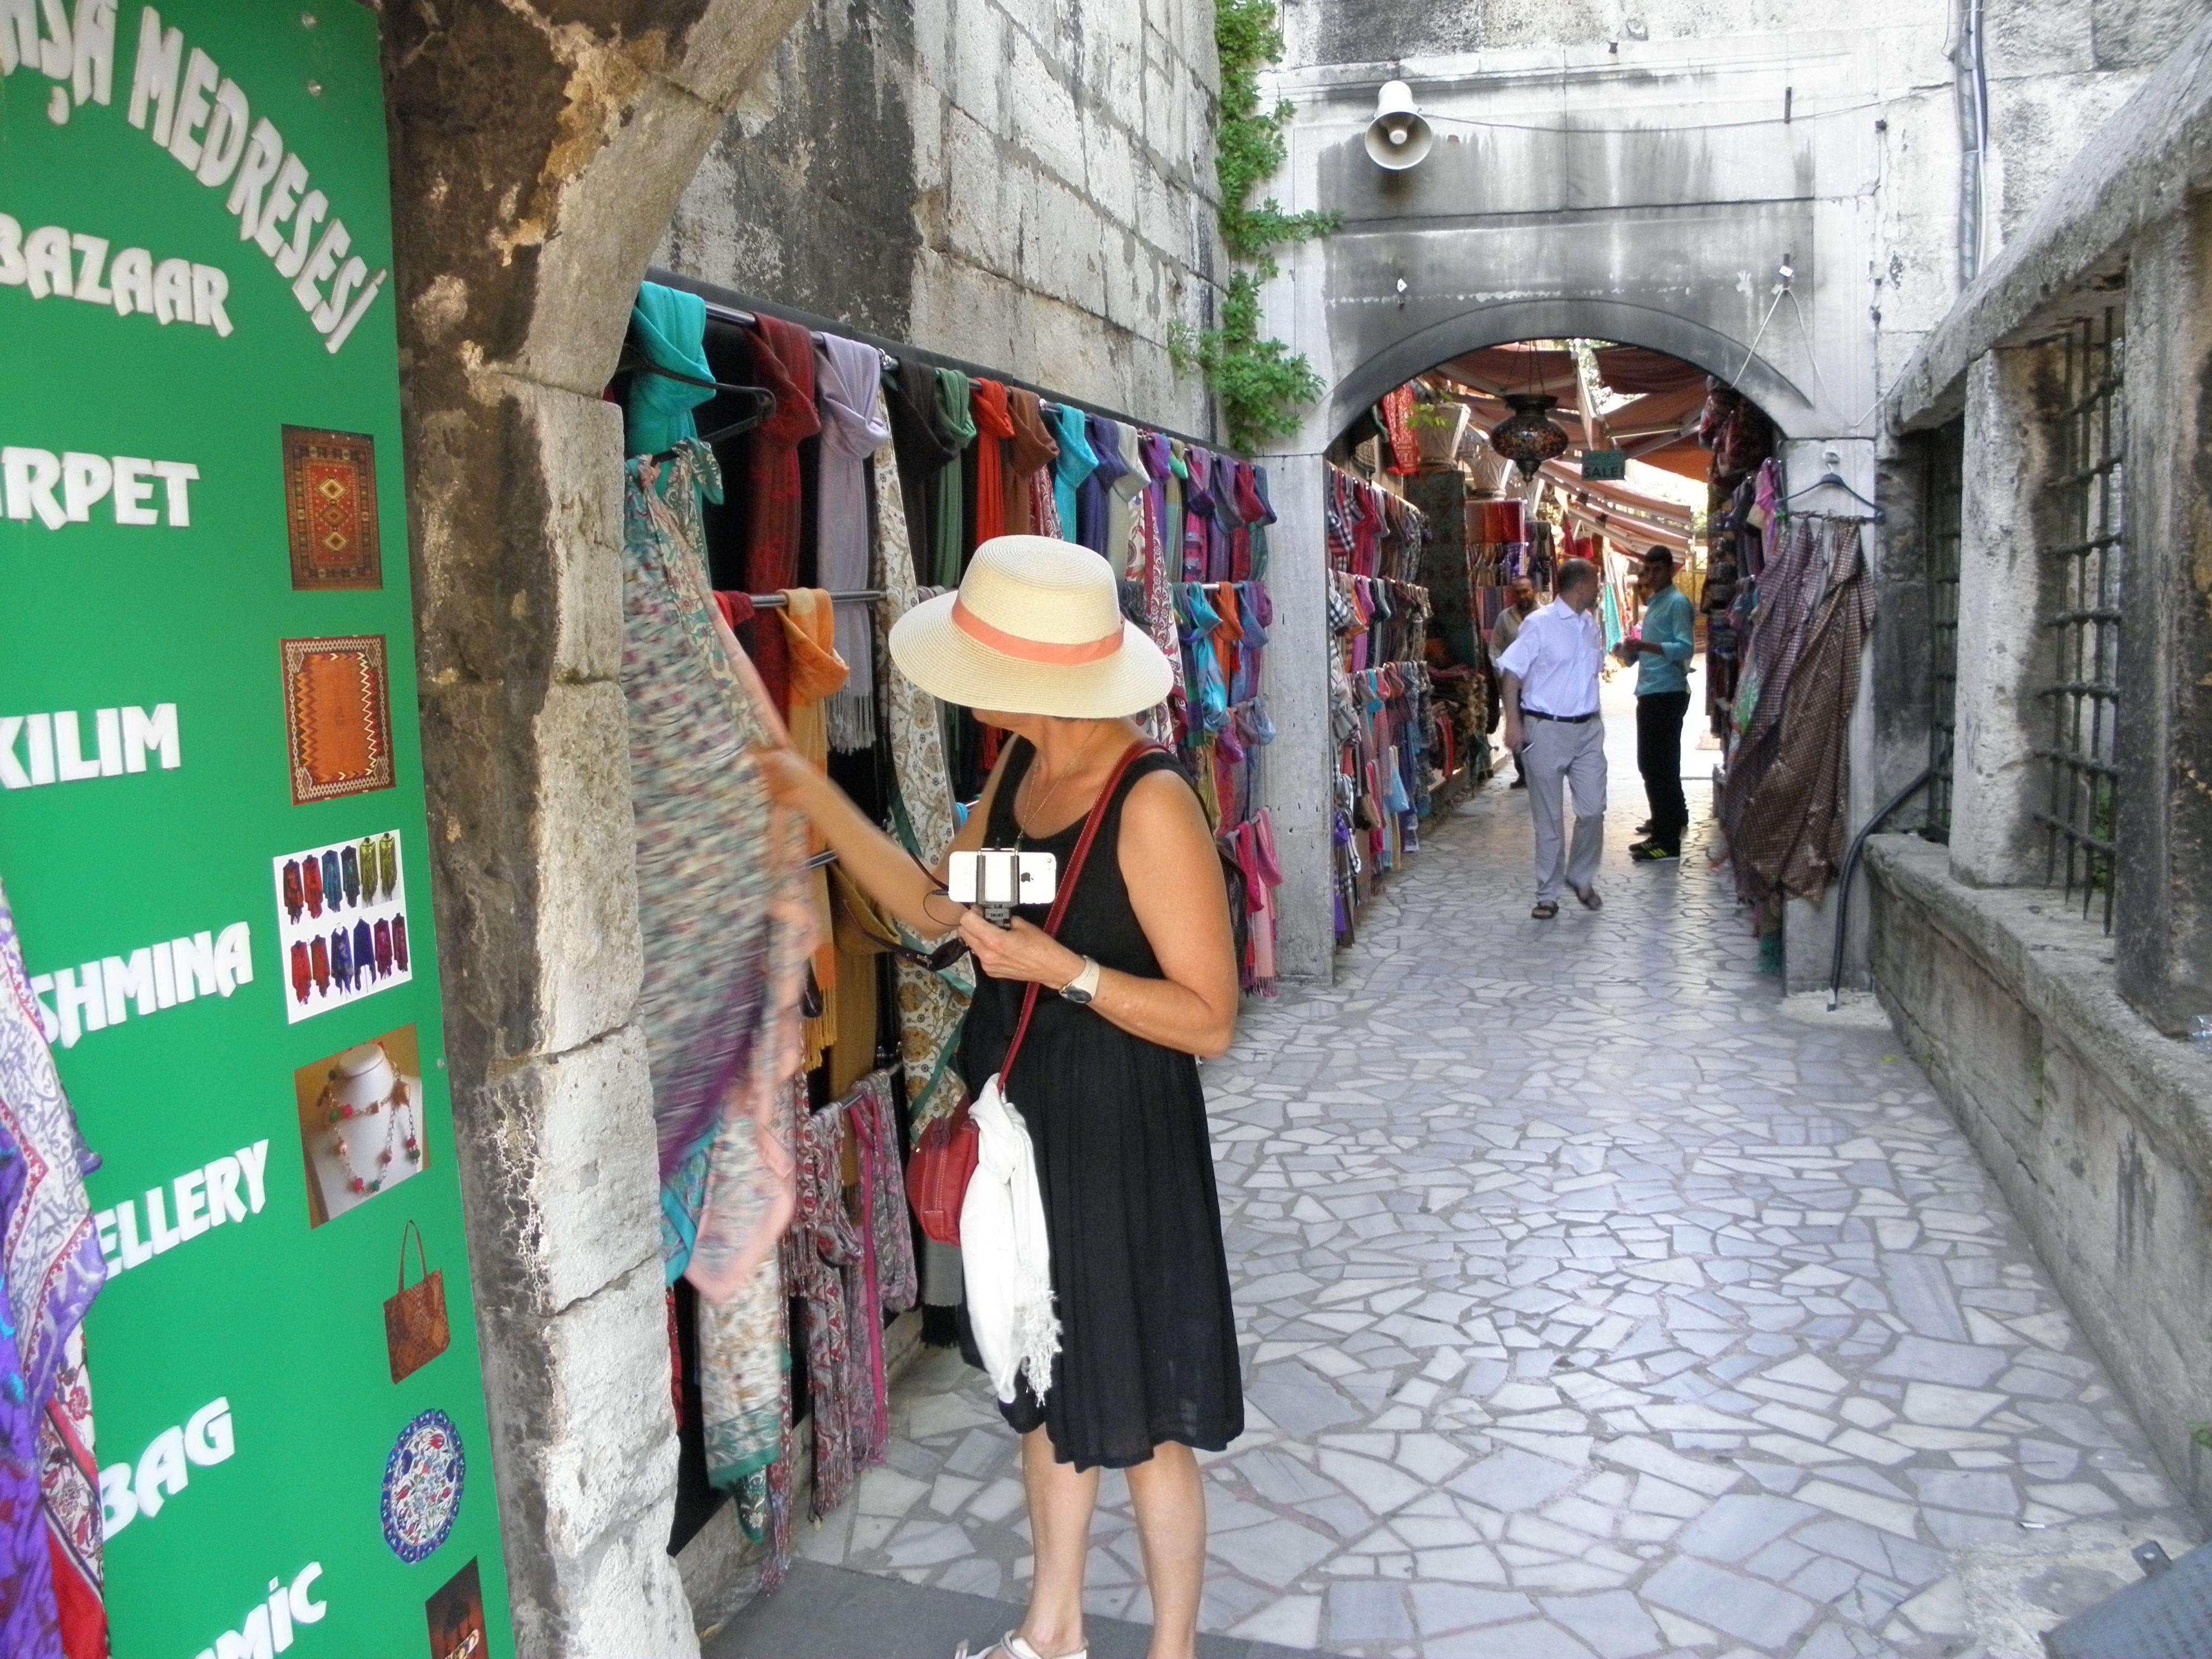 Shopping in istanbul lola stoker ududud luxurytravelboutique